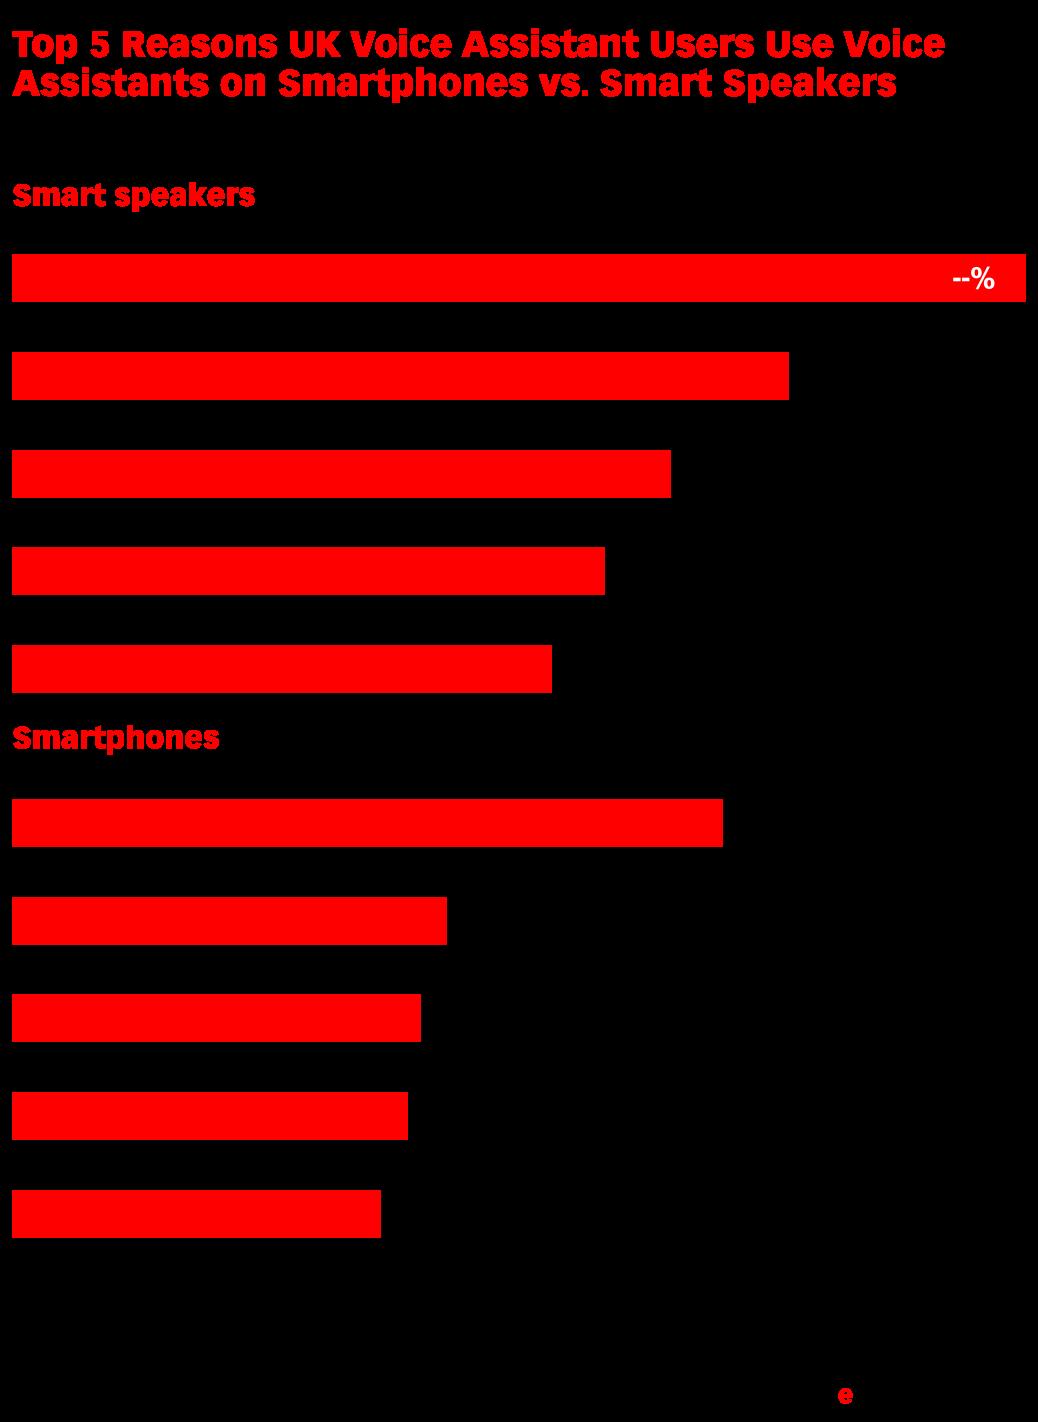 Top 5 Reasons UK Voice Assistant Users Use Voice Assistants on Smartphones vs. Smart Speakers (% of respondents, June 2018)